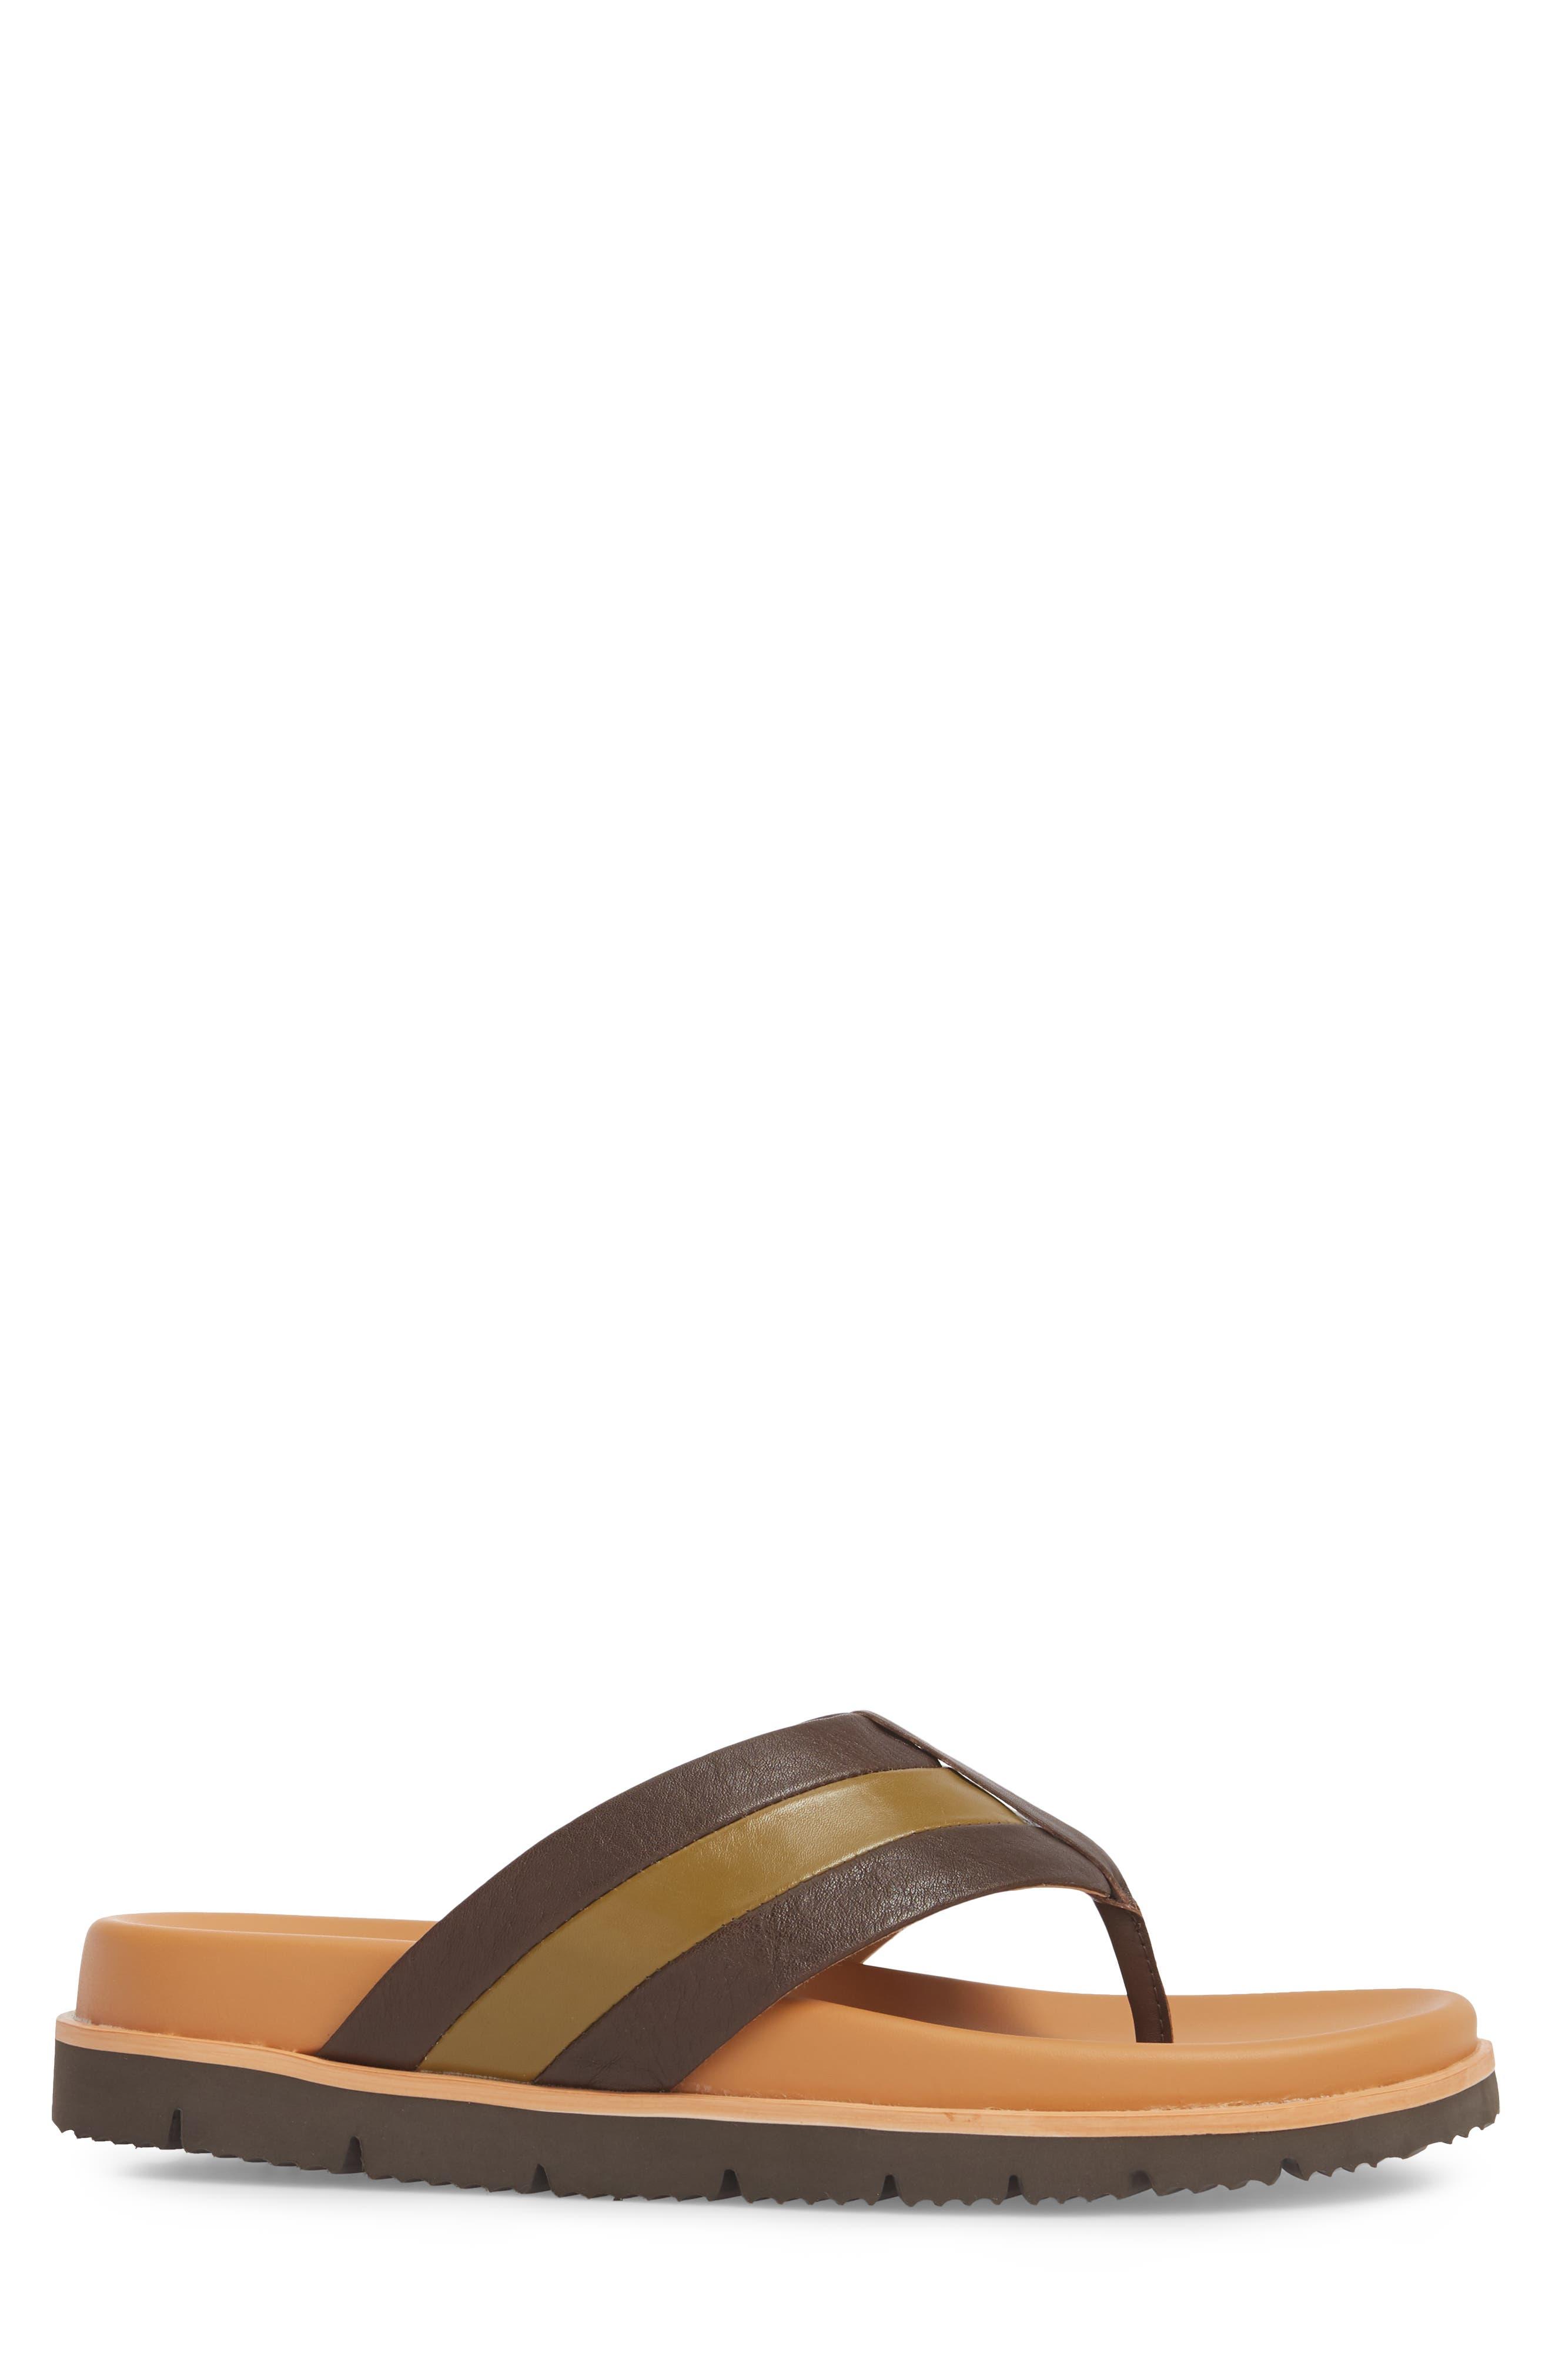 Bryce Striped Flip Flop,                             Alternate thumbnail 6, color,